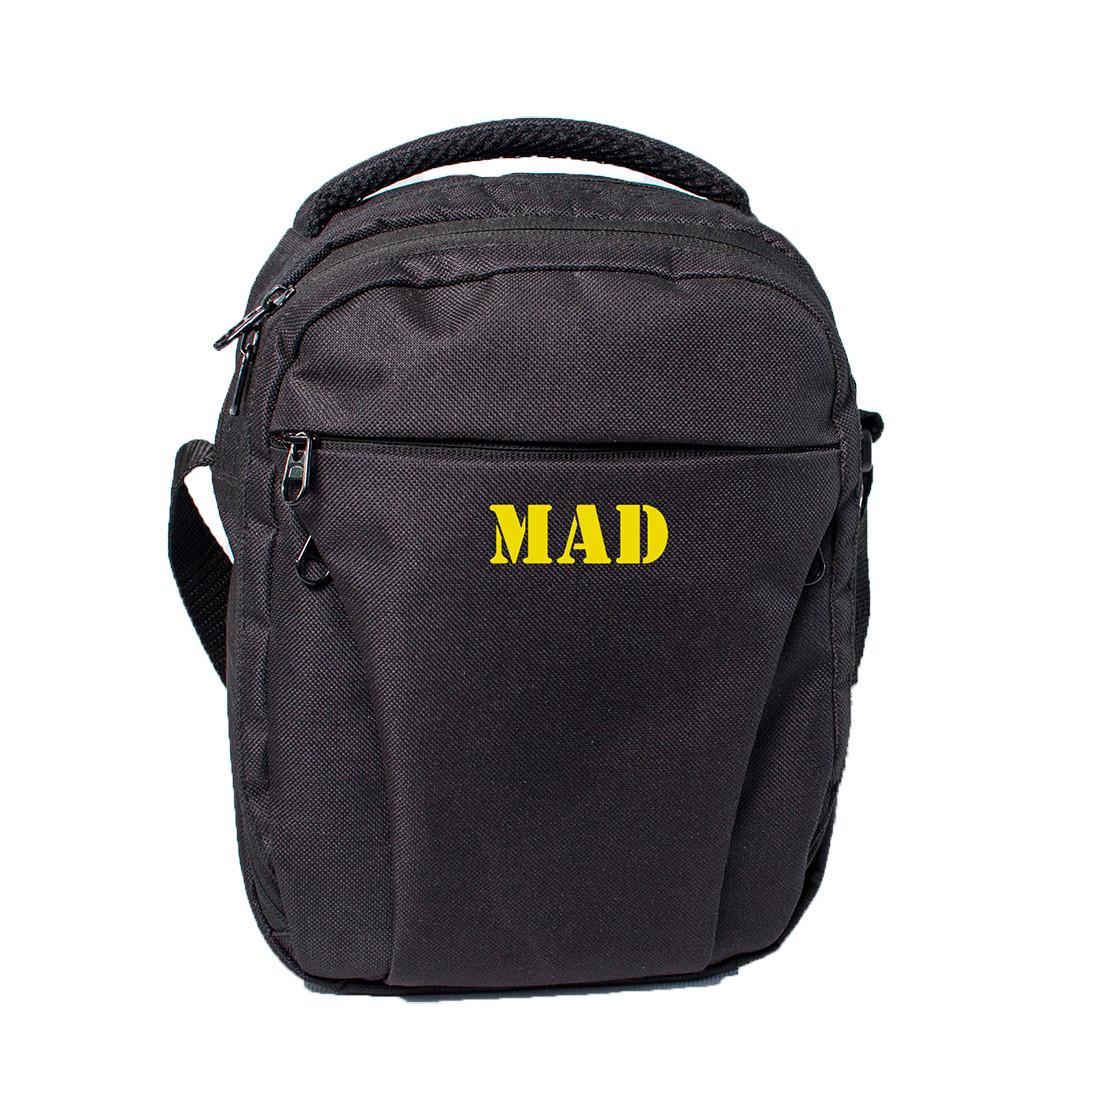 Мессенджер Prime від MAD | born to win™